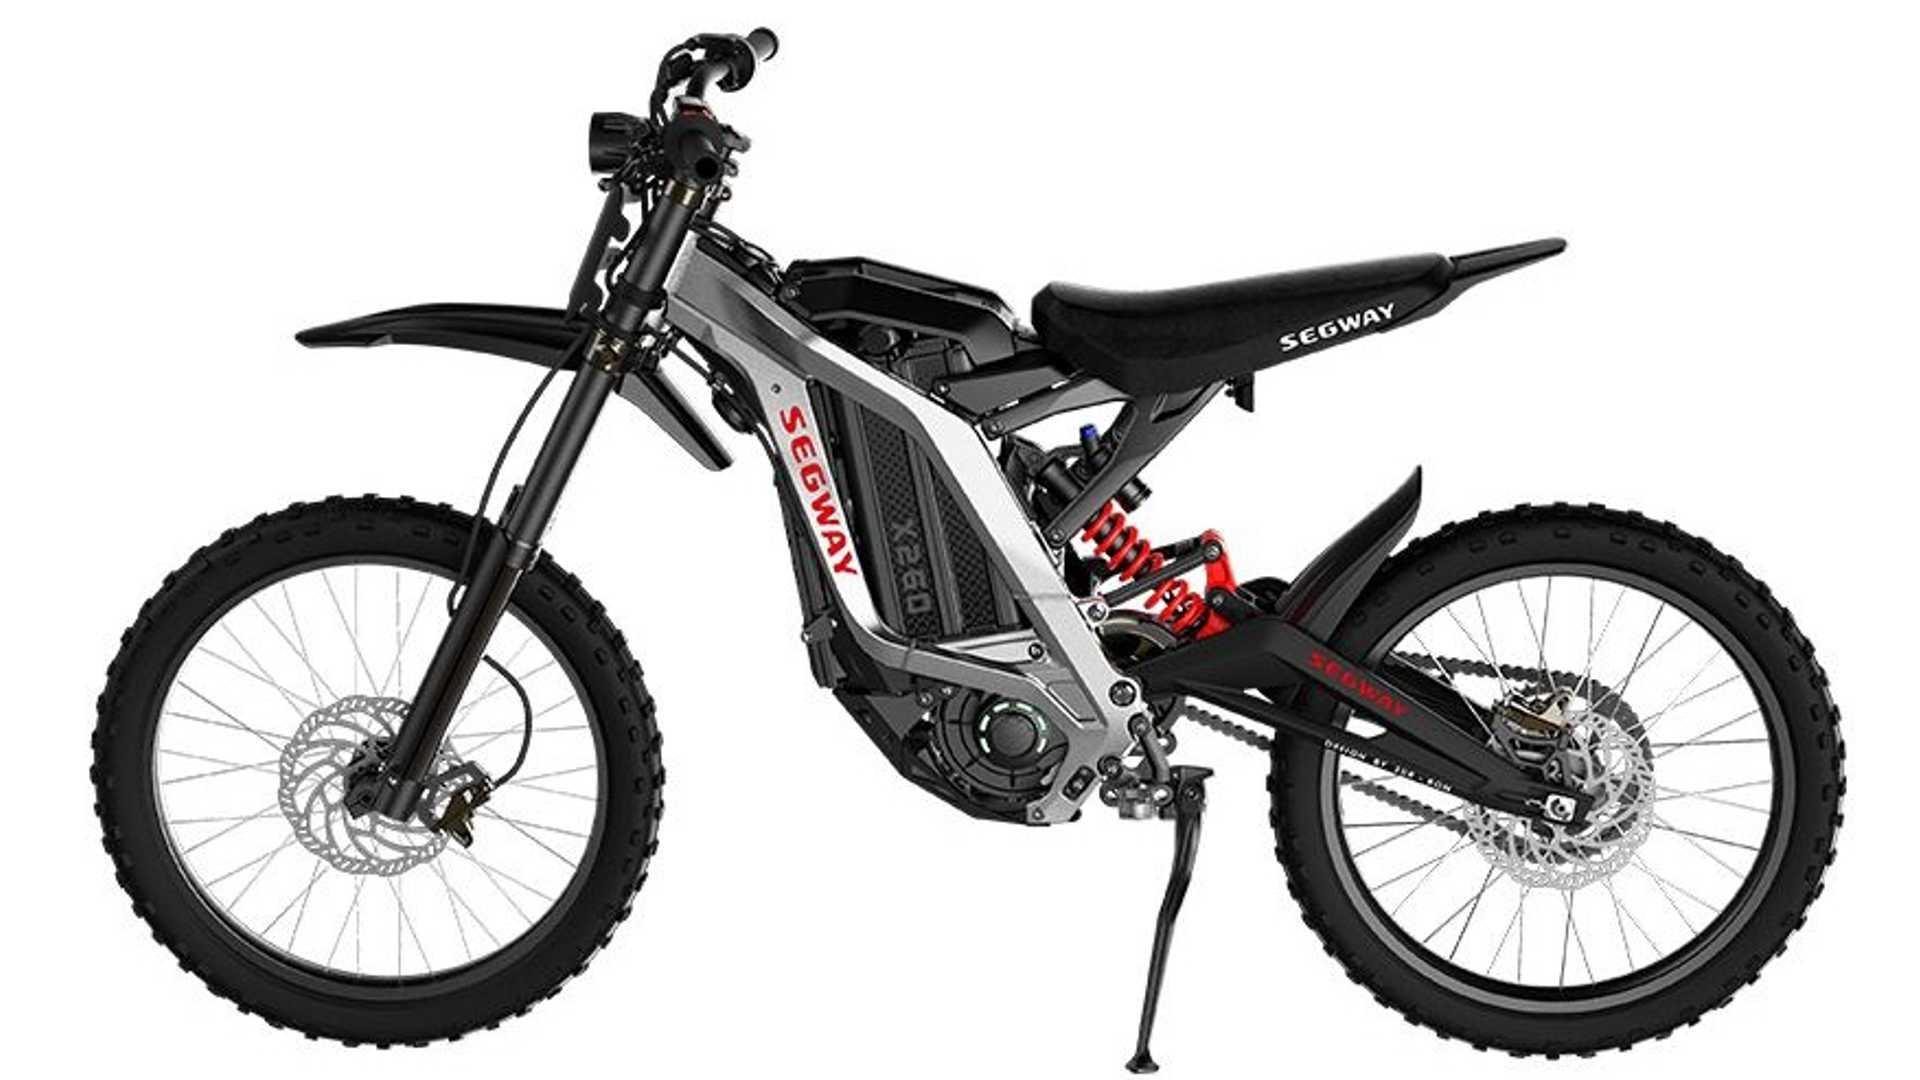 Segway E Bike